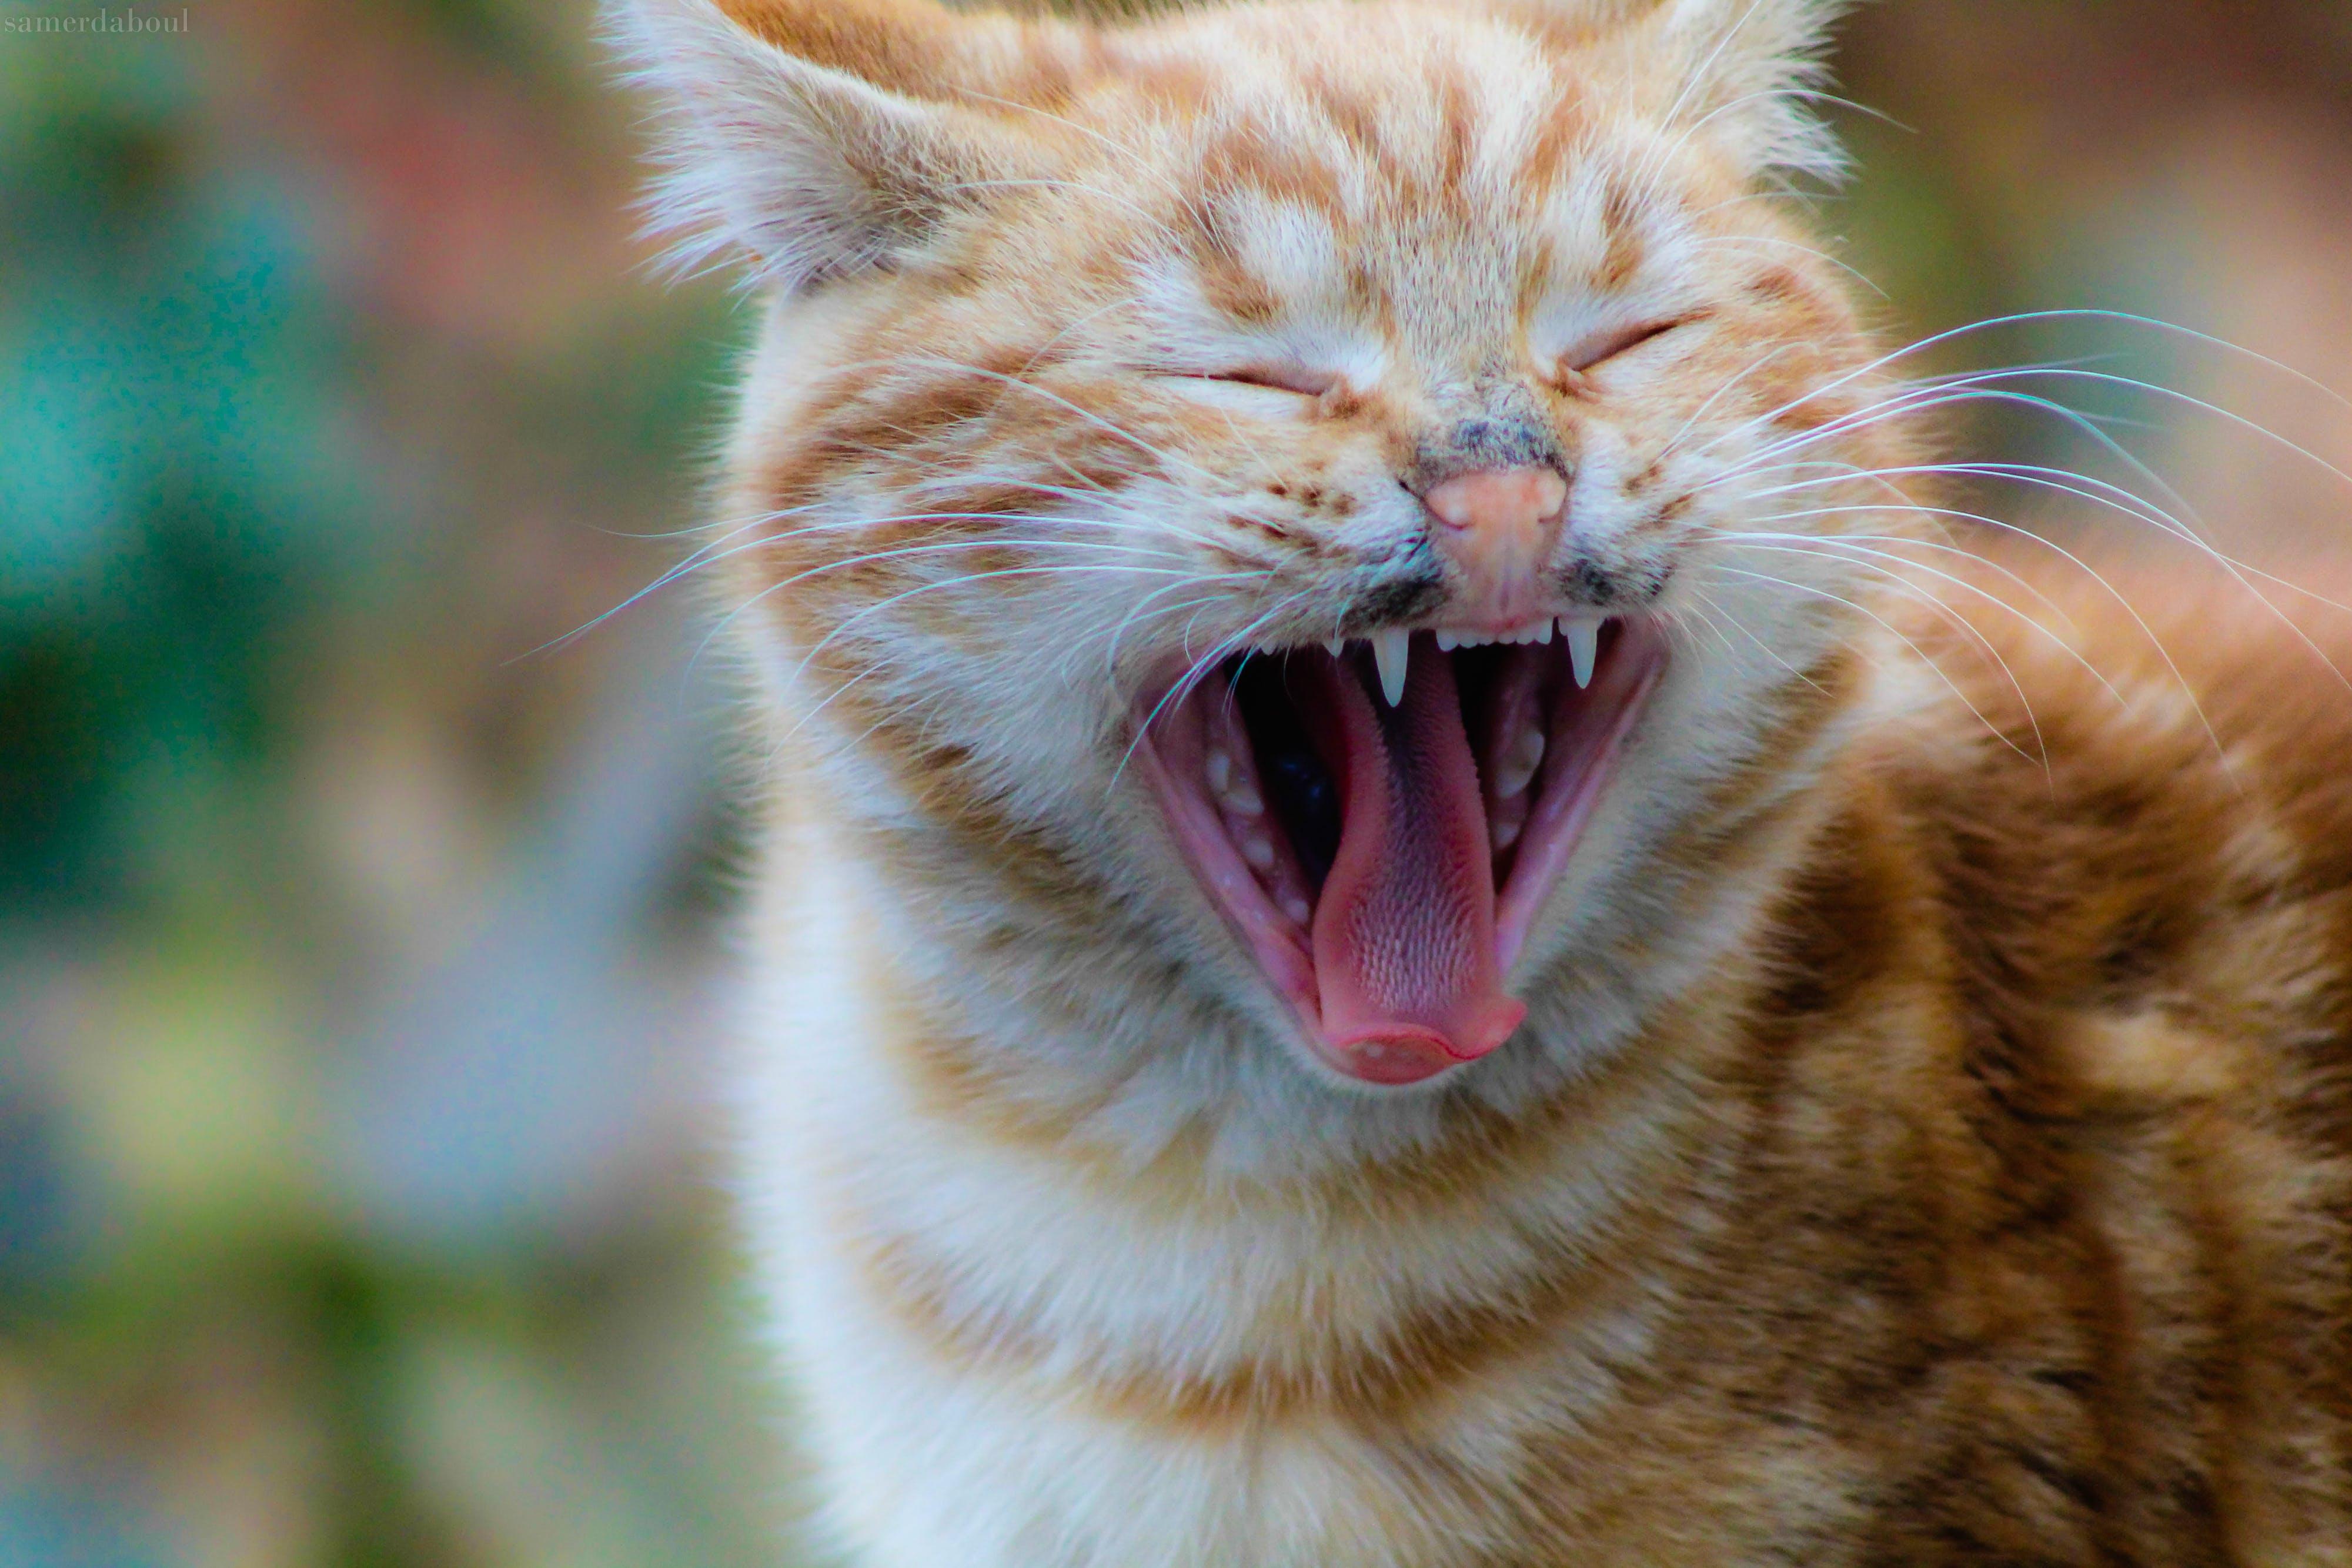 Selective Focus Photography of Yawning Orange Tabby Cat